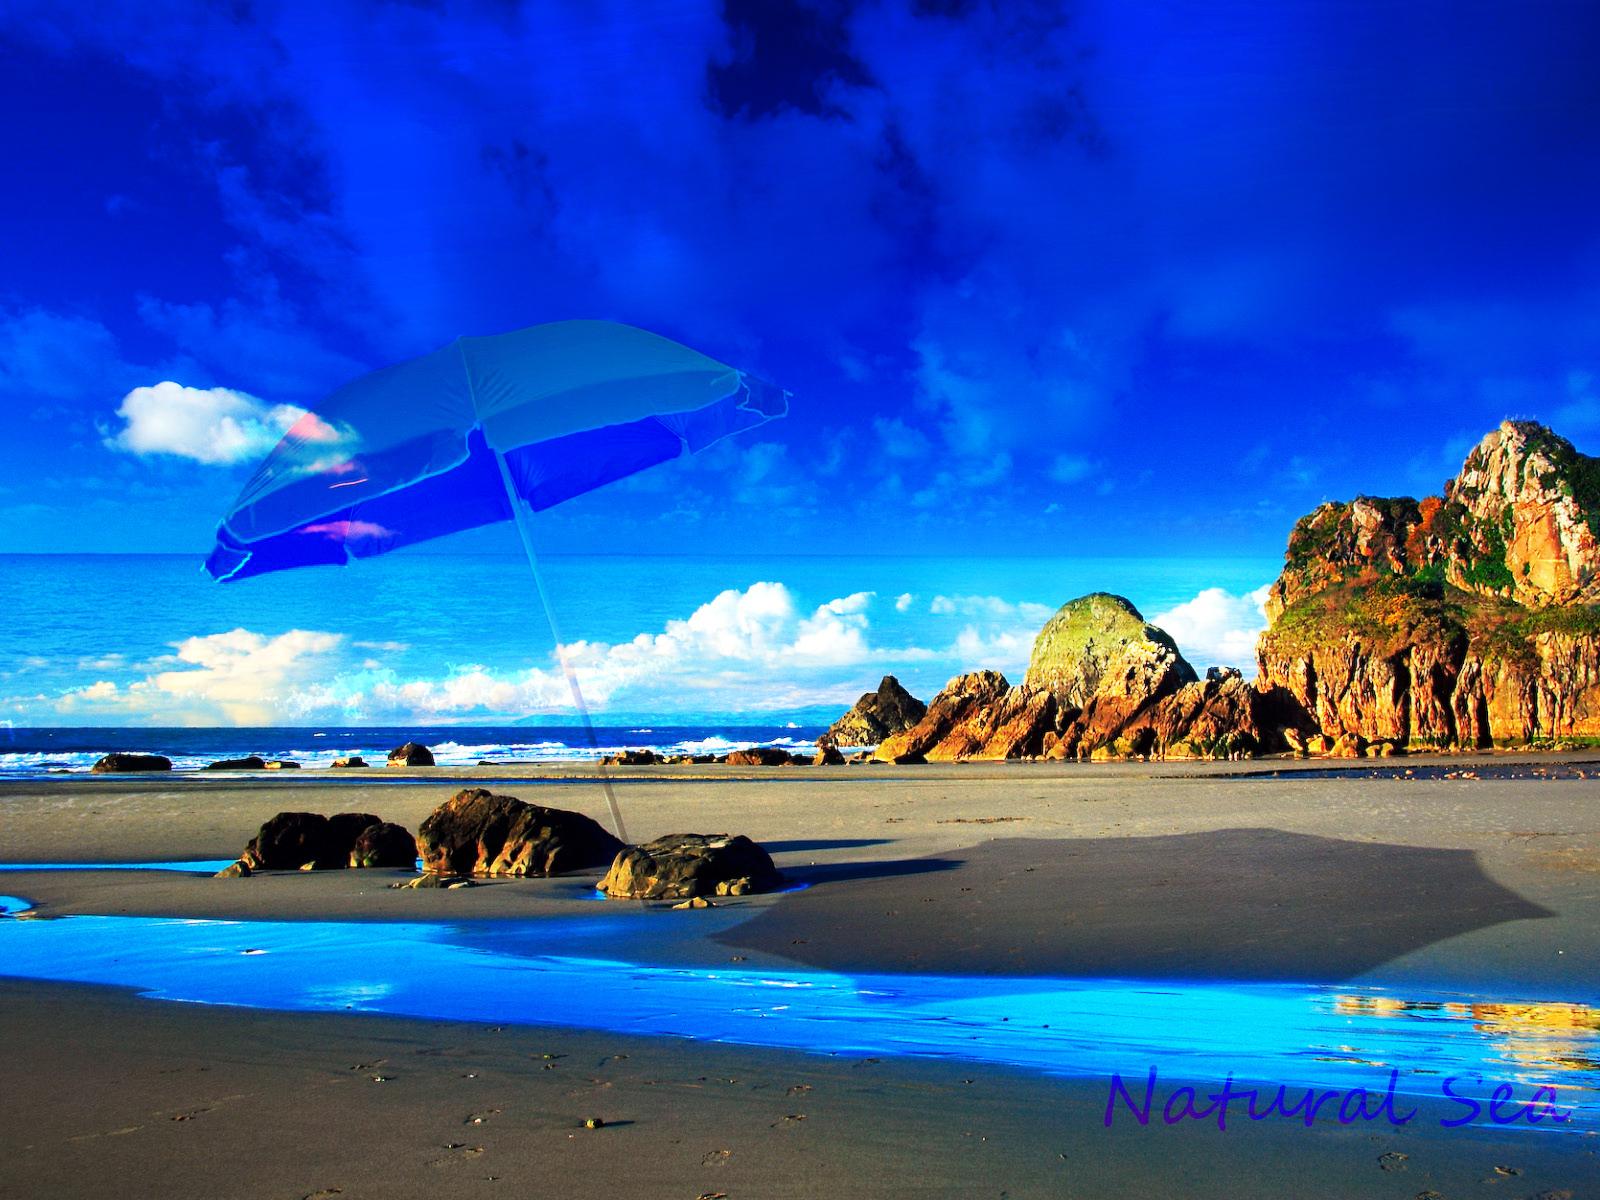 Facebook Cover Photo & HD Wallpaper